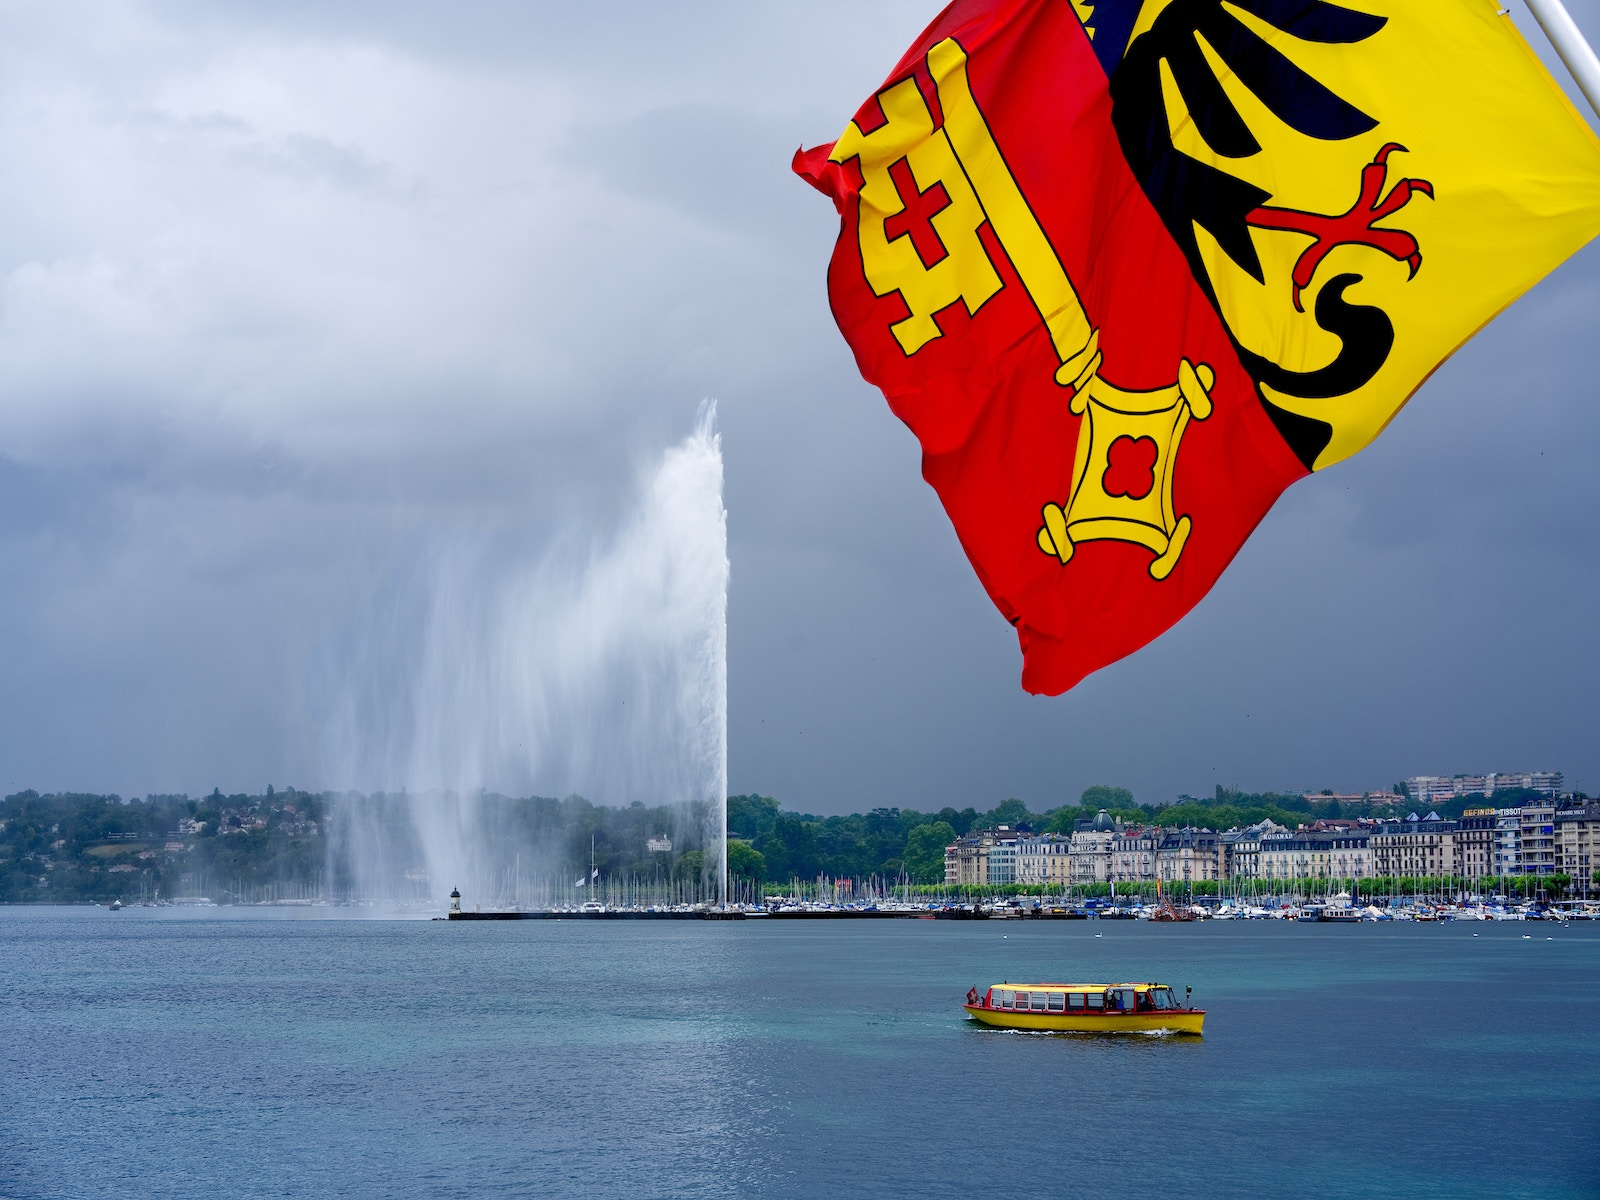 Genfer Stadtfahne am Lac Leman